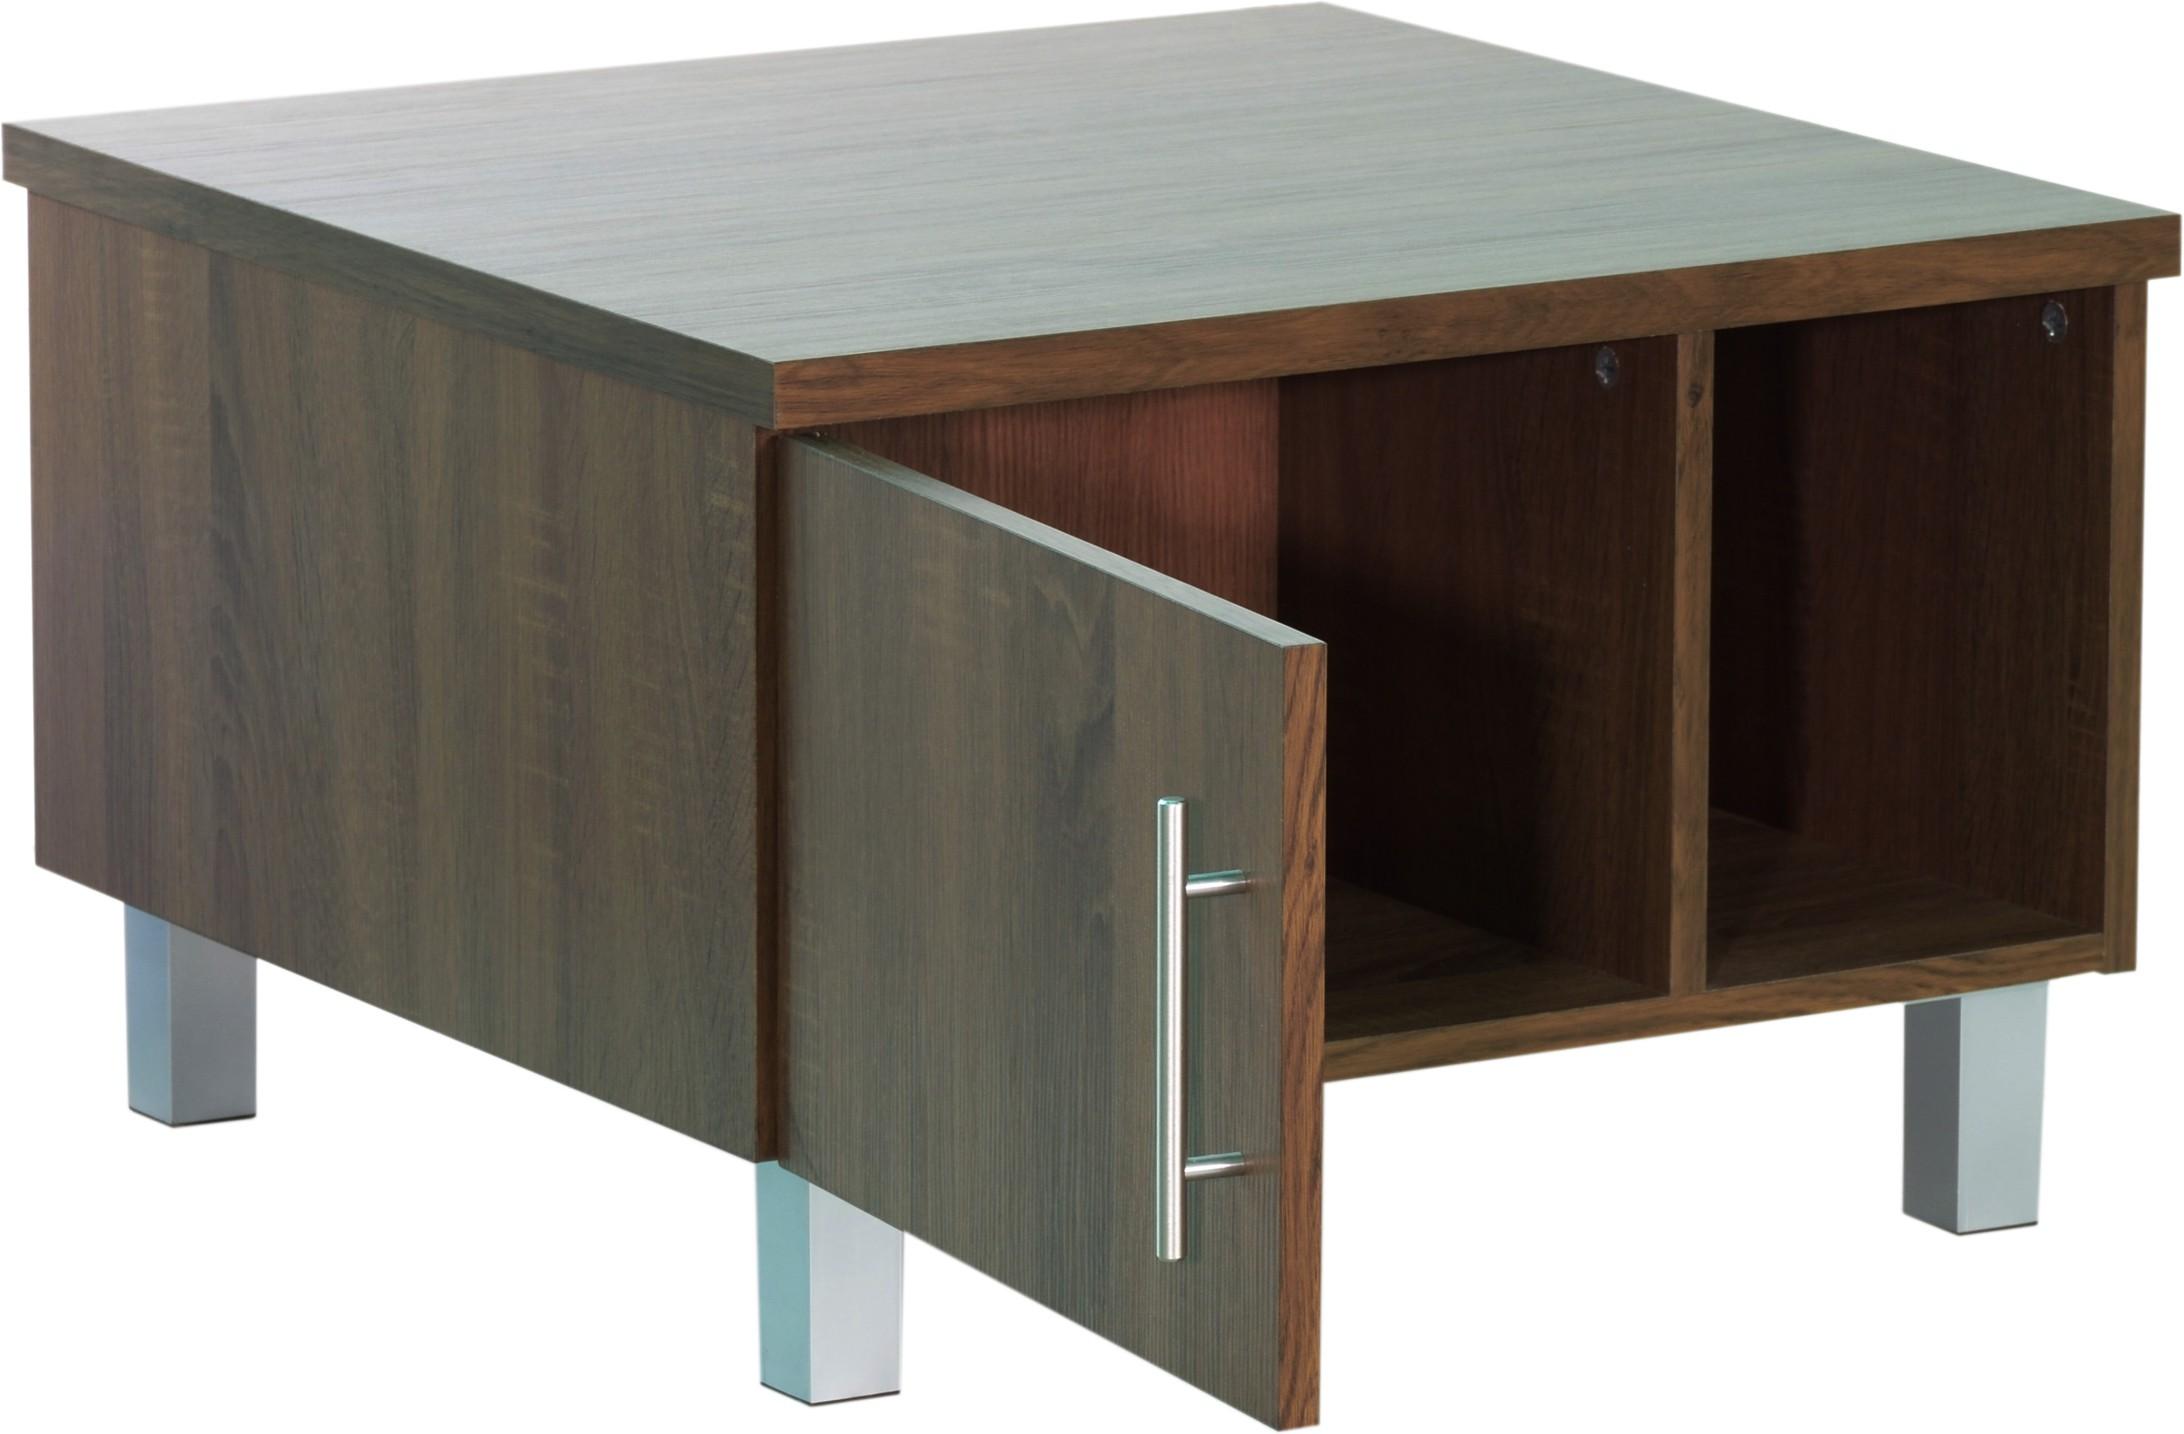 View homestock Engineered Wood Coffee Table(Finish Color - Walnut Brown) Furniture (HOMESTOCK)